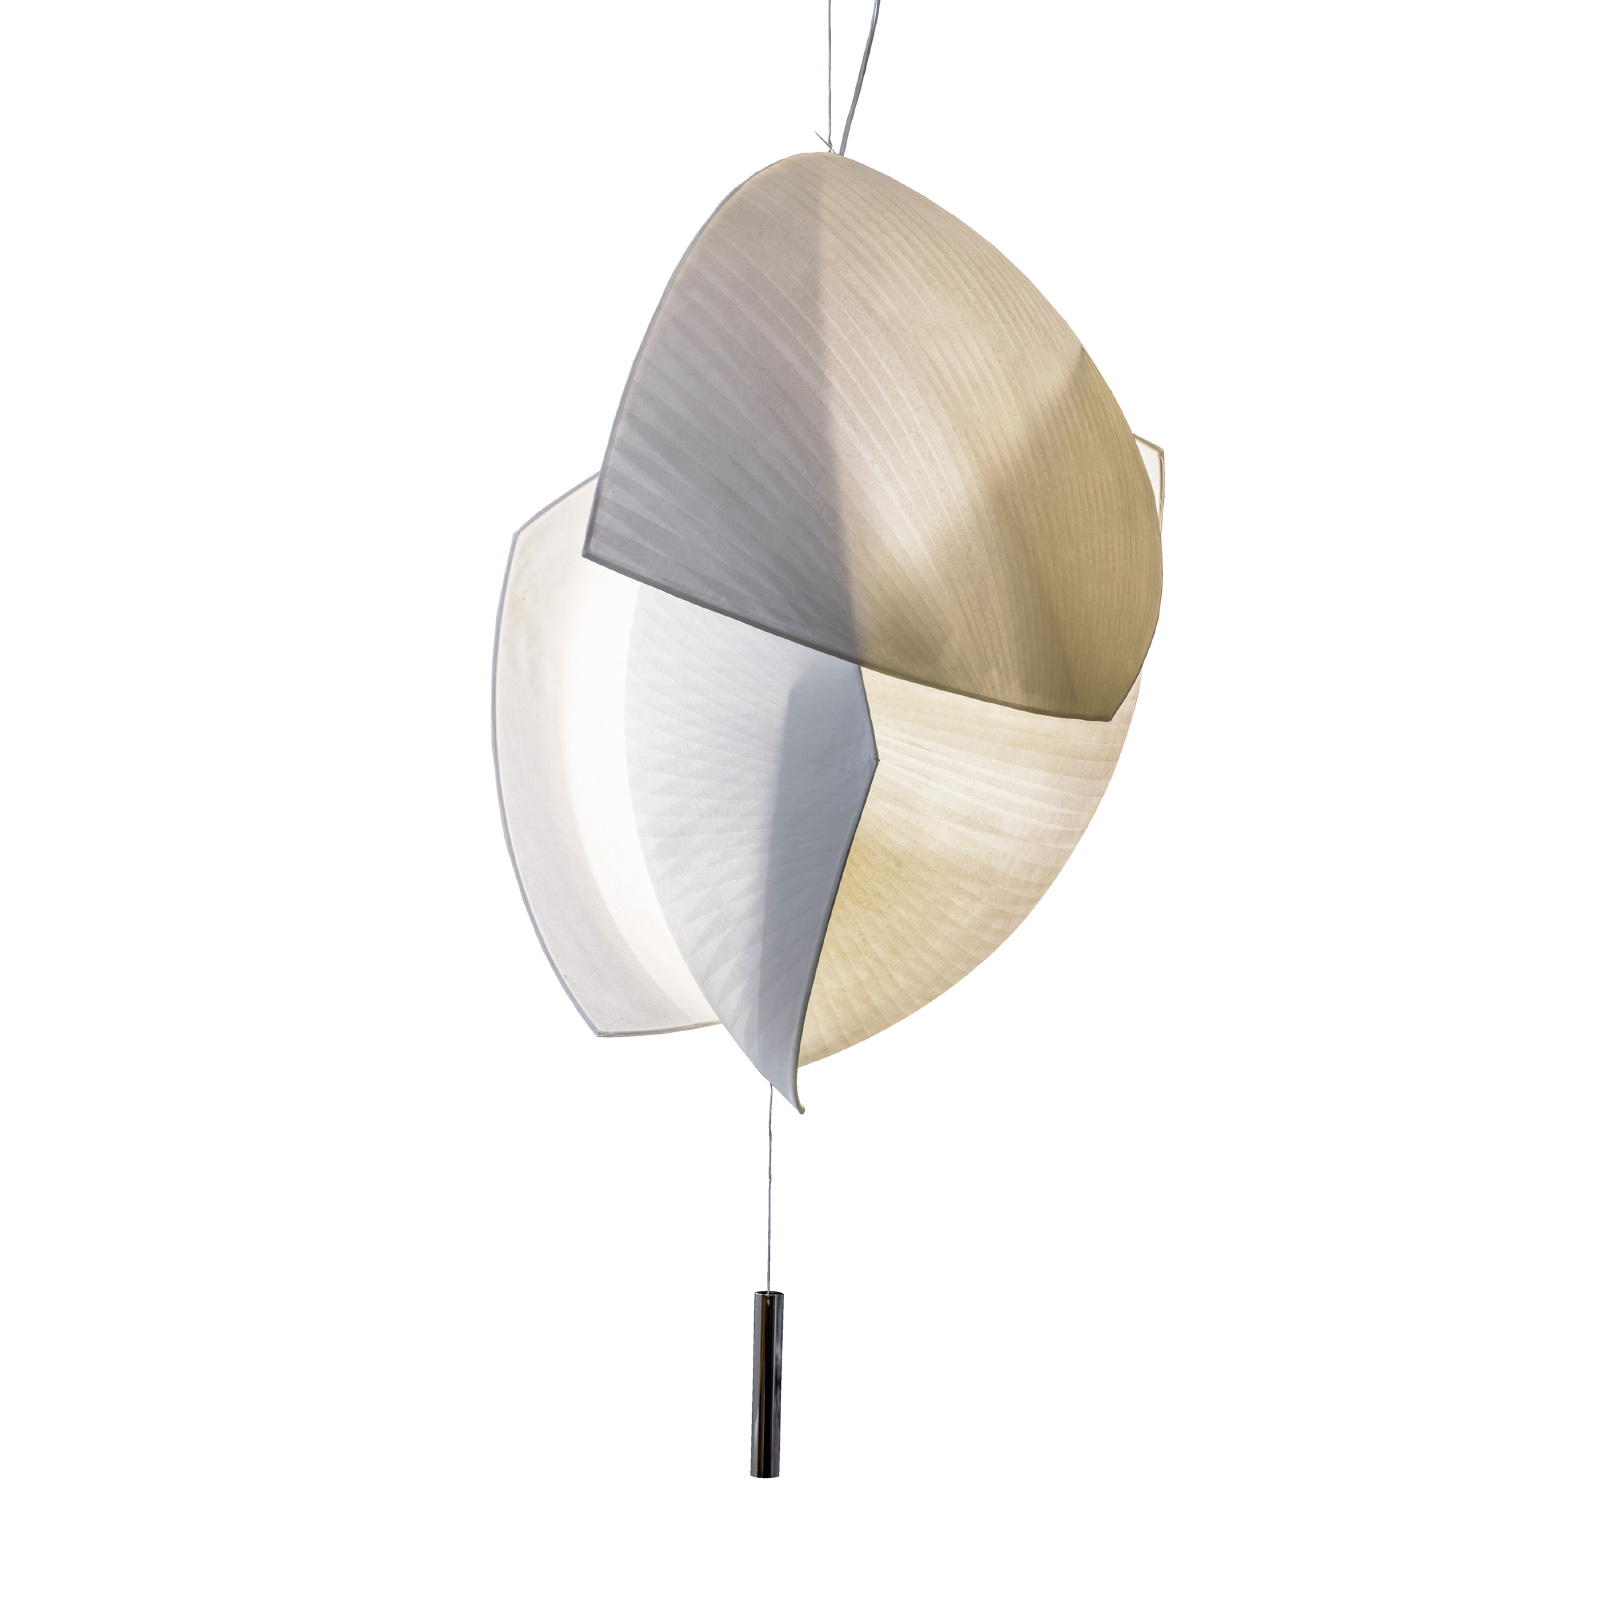 Grok Voiles LED-Hängelampe 95x70 cm, dimmbar 1-10V